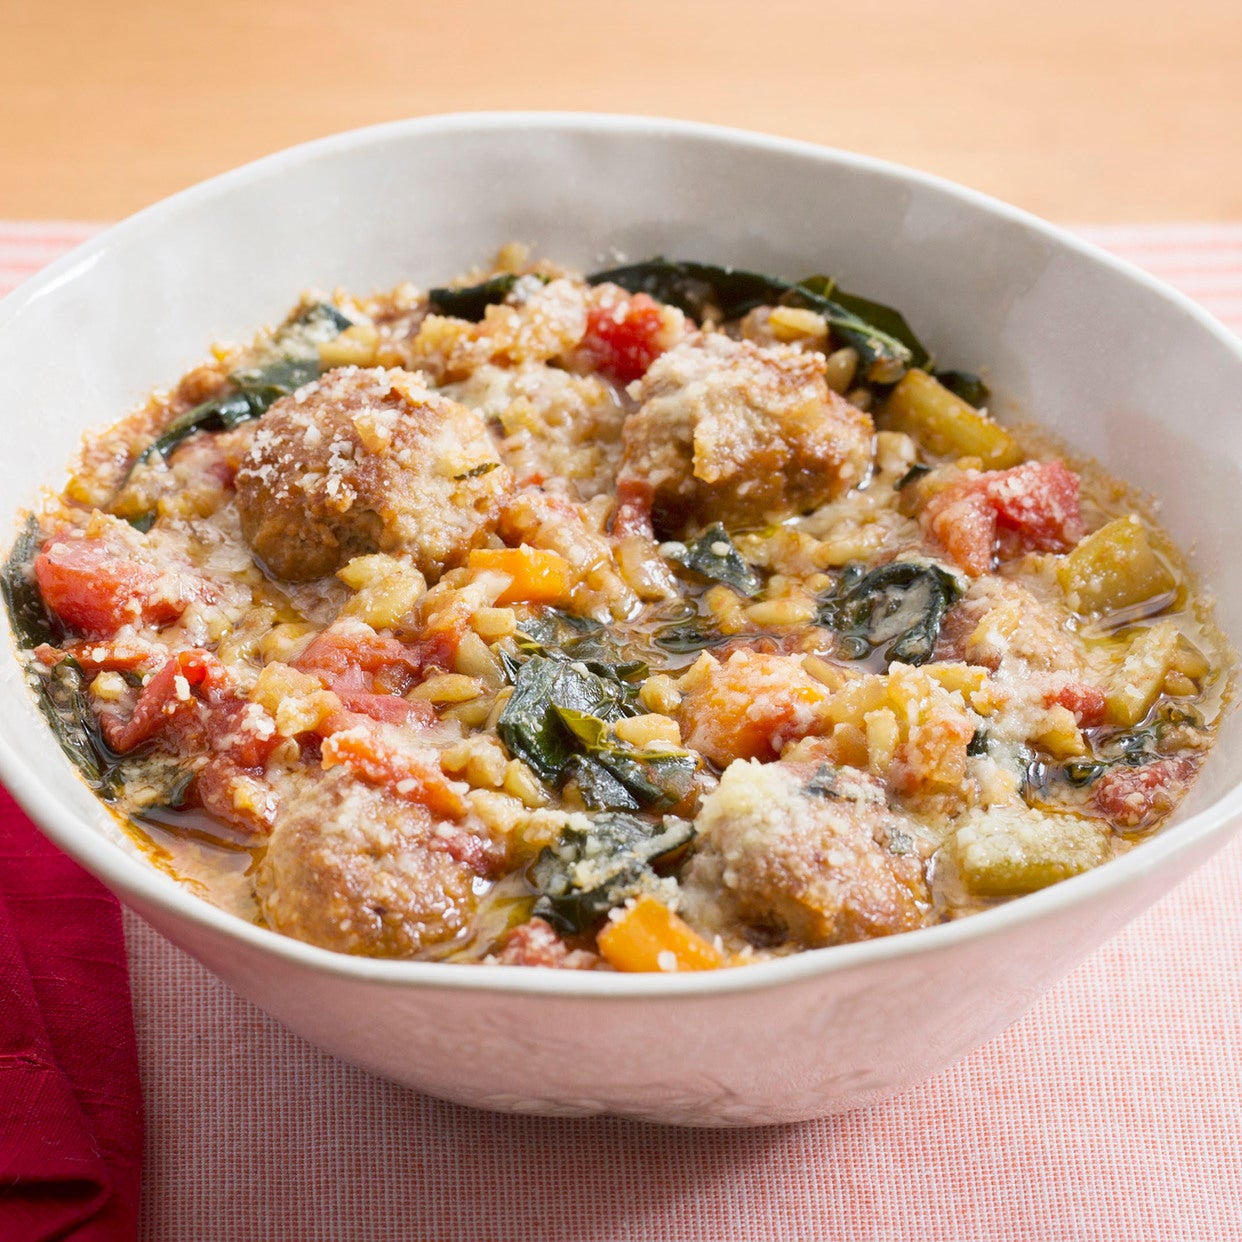 Italian Wedding Soup with Pork Meatballs